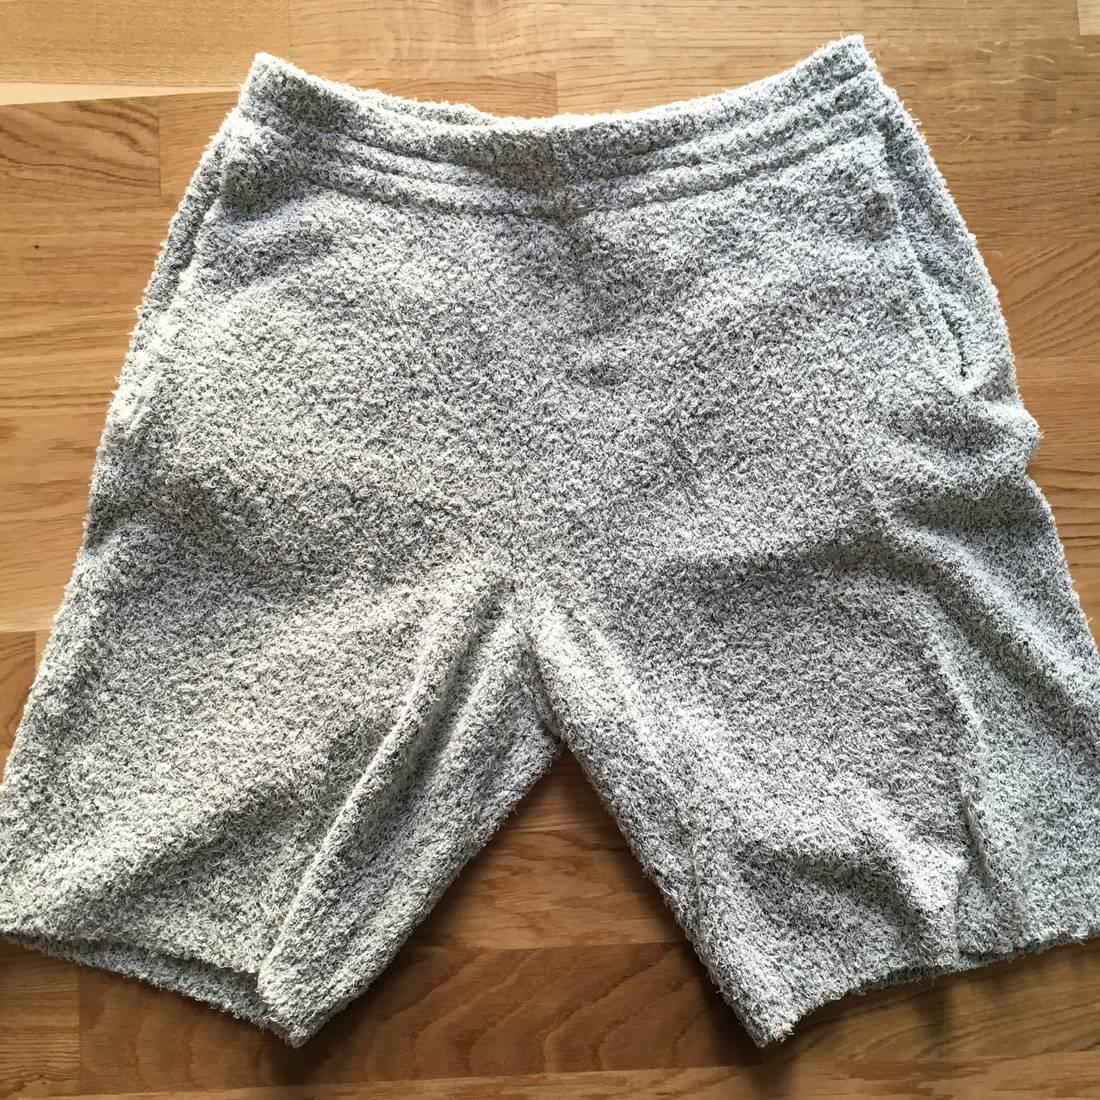 Maison Margiela Textured Knit Shorts Size 33 - Shorts for Sale - Grailed